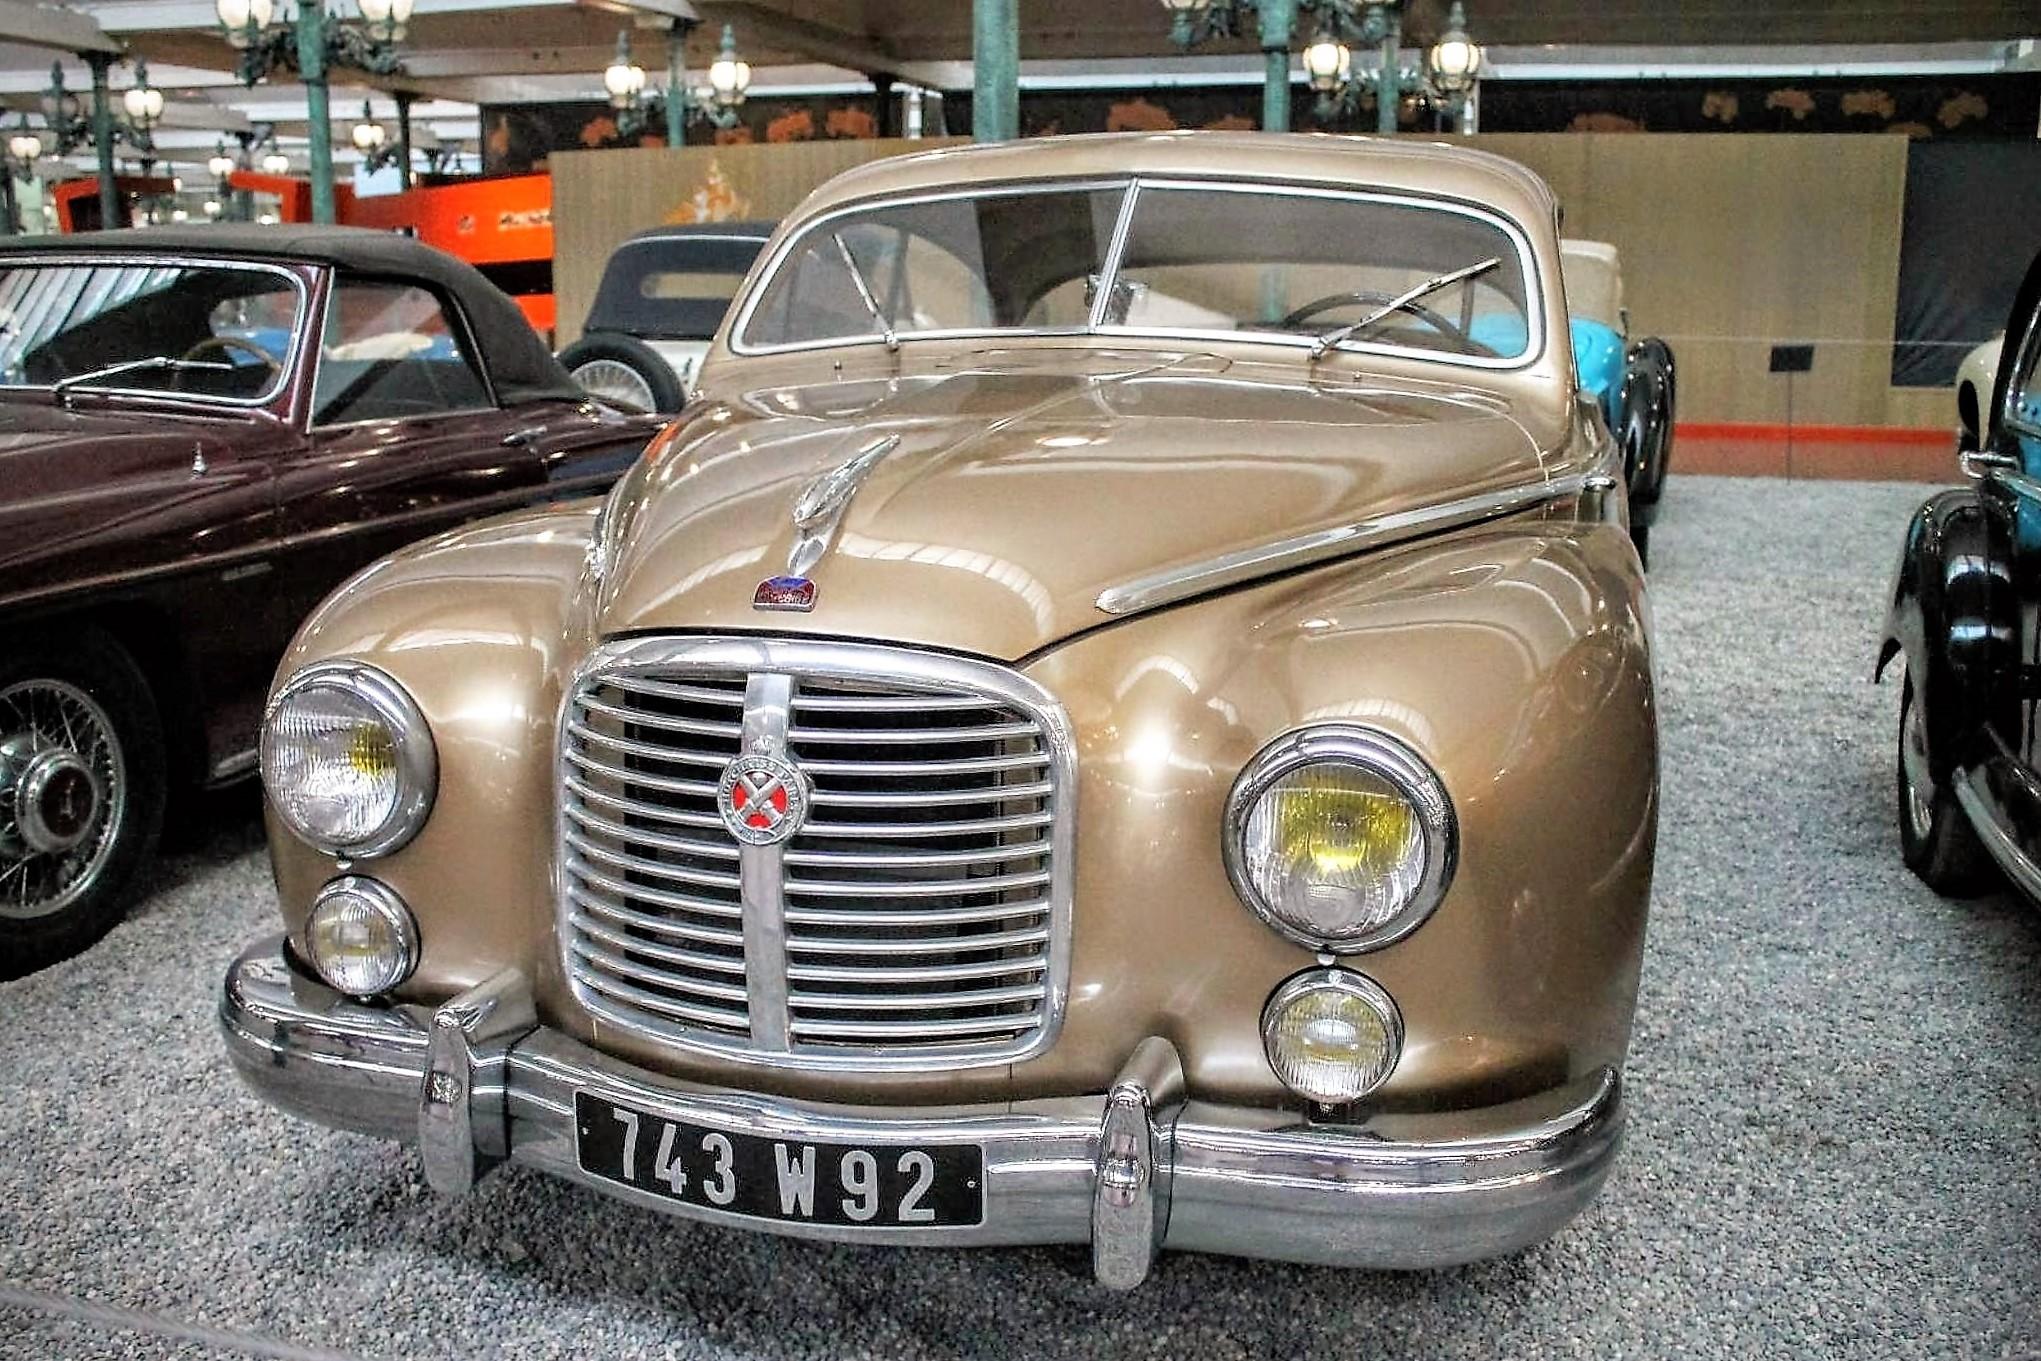 Musee Automobiles De Mulhouse